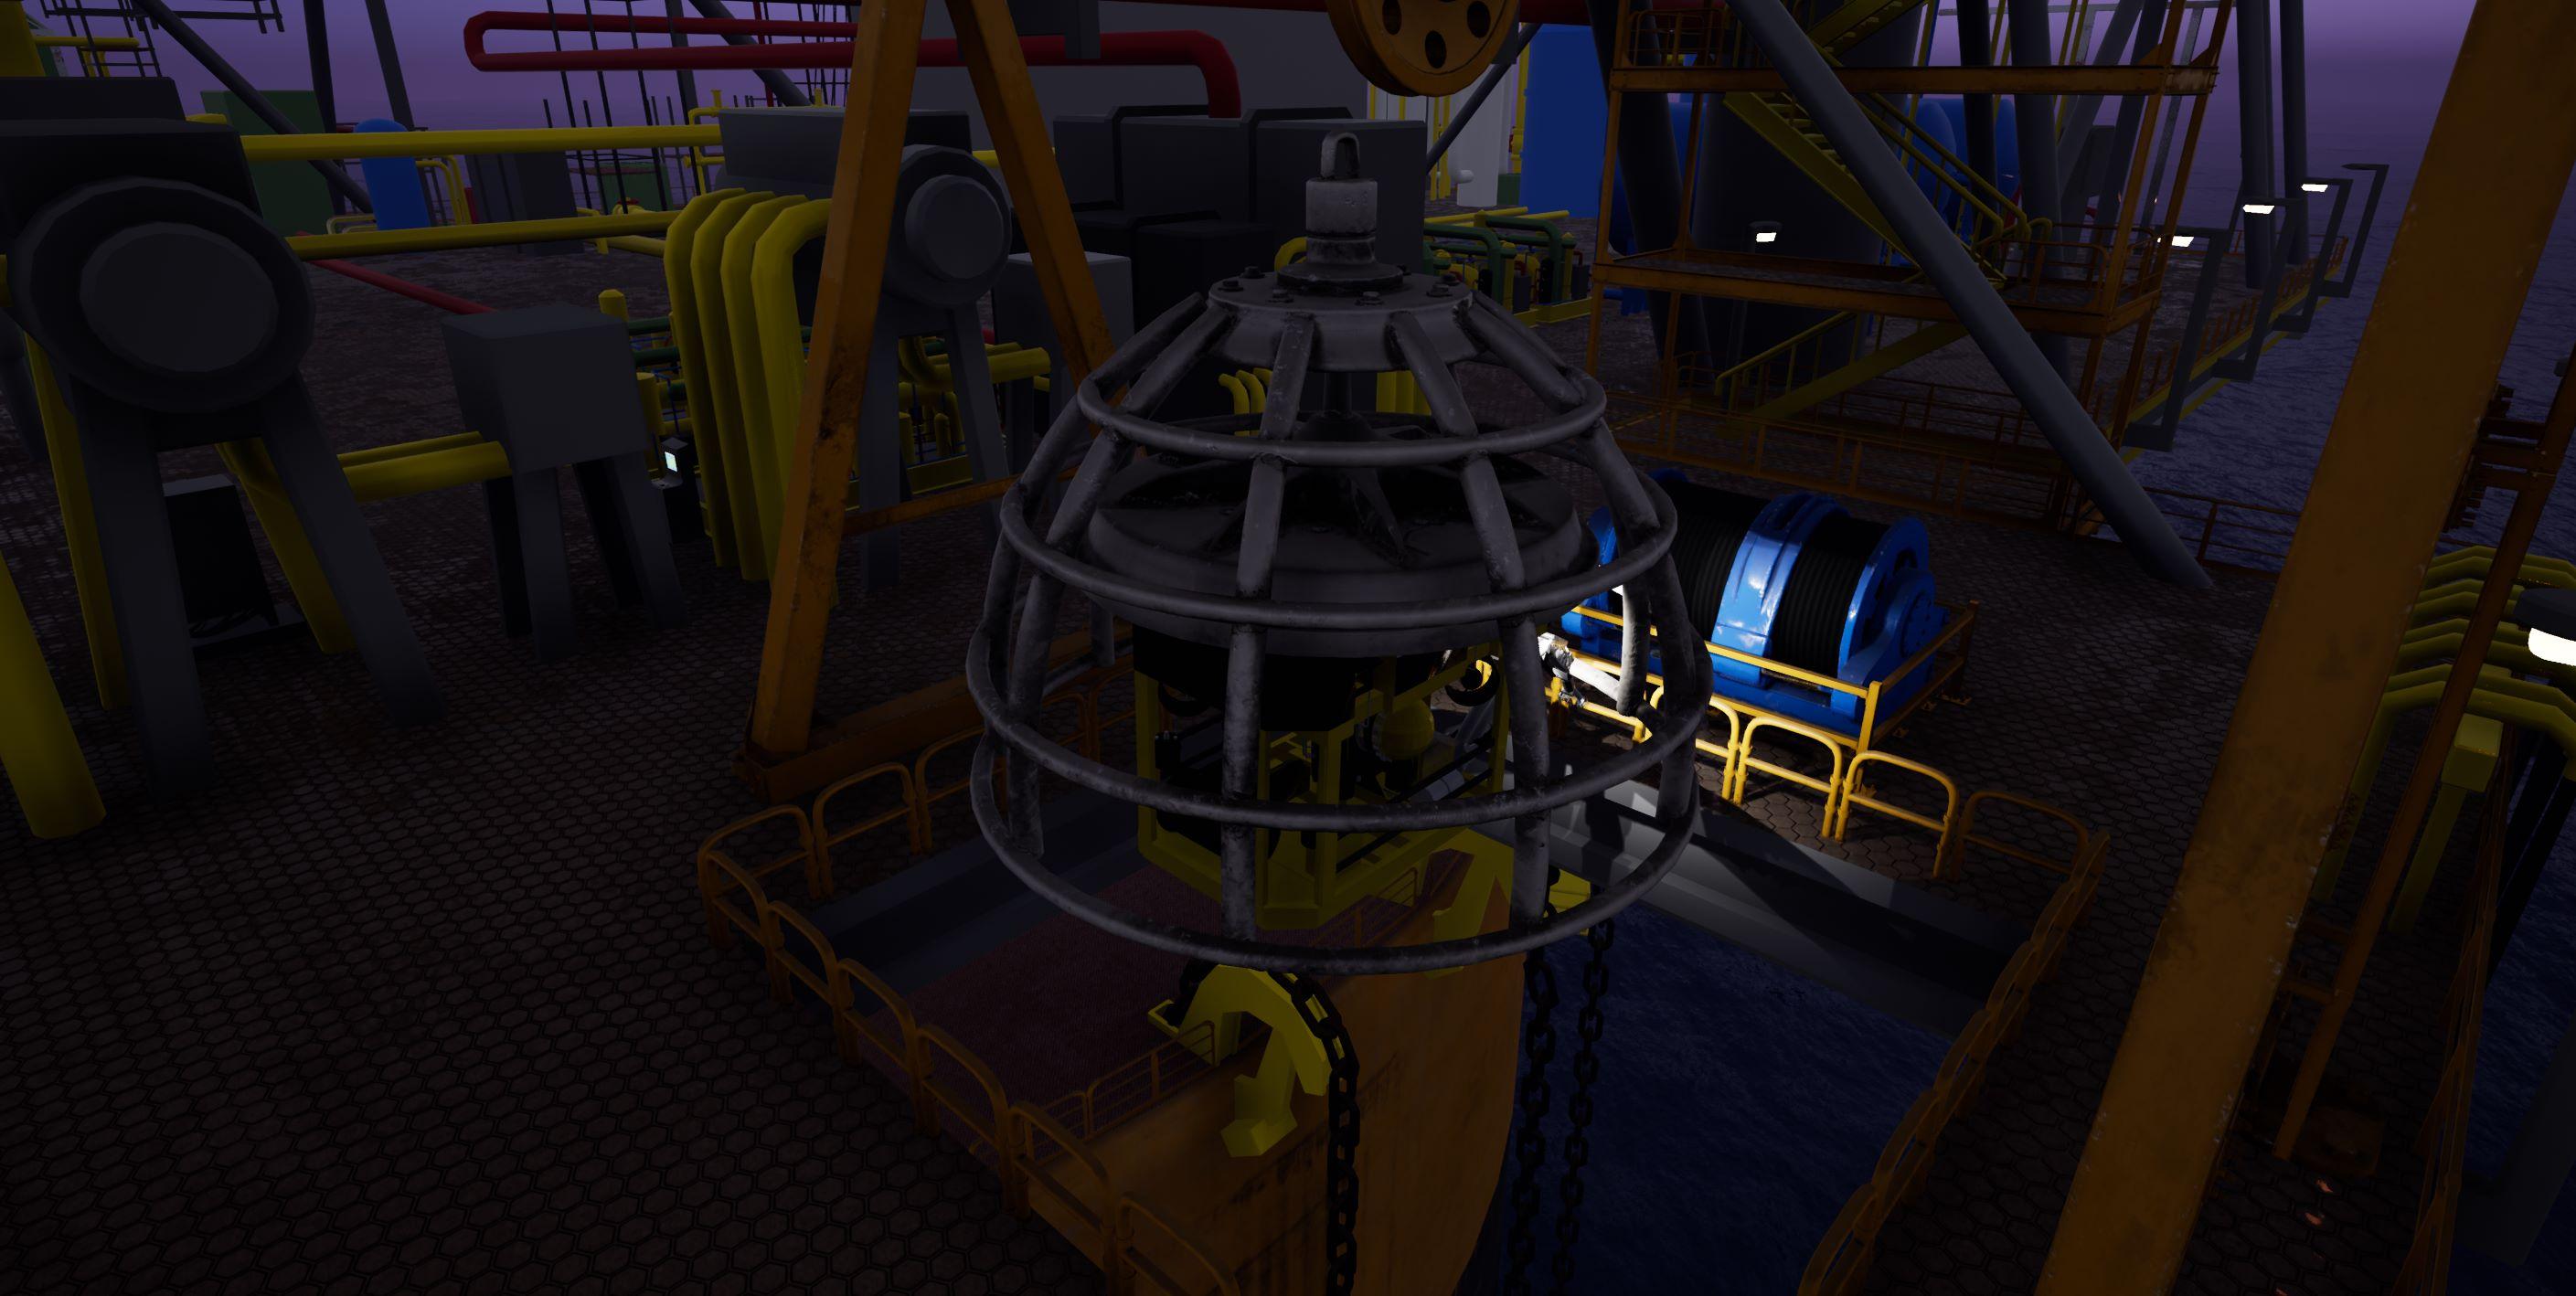 Sub sea robot cage